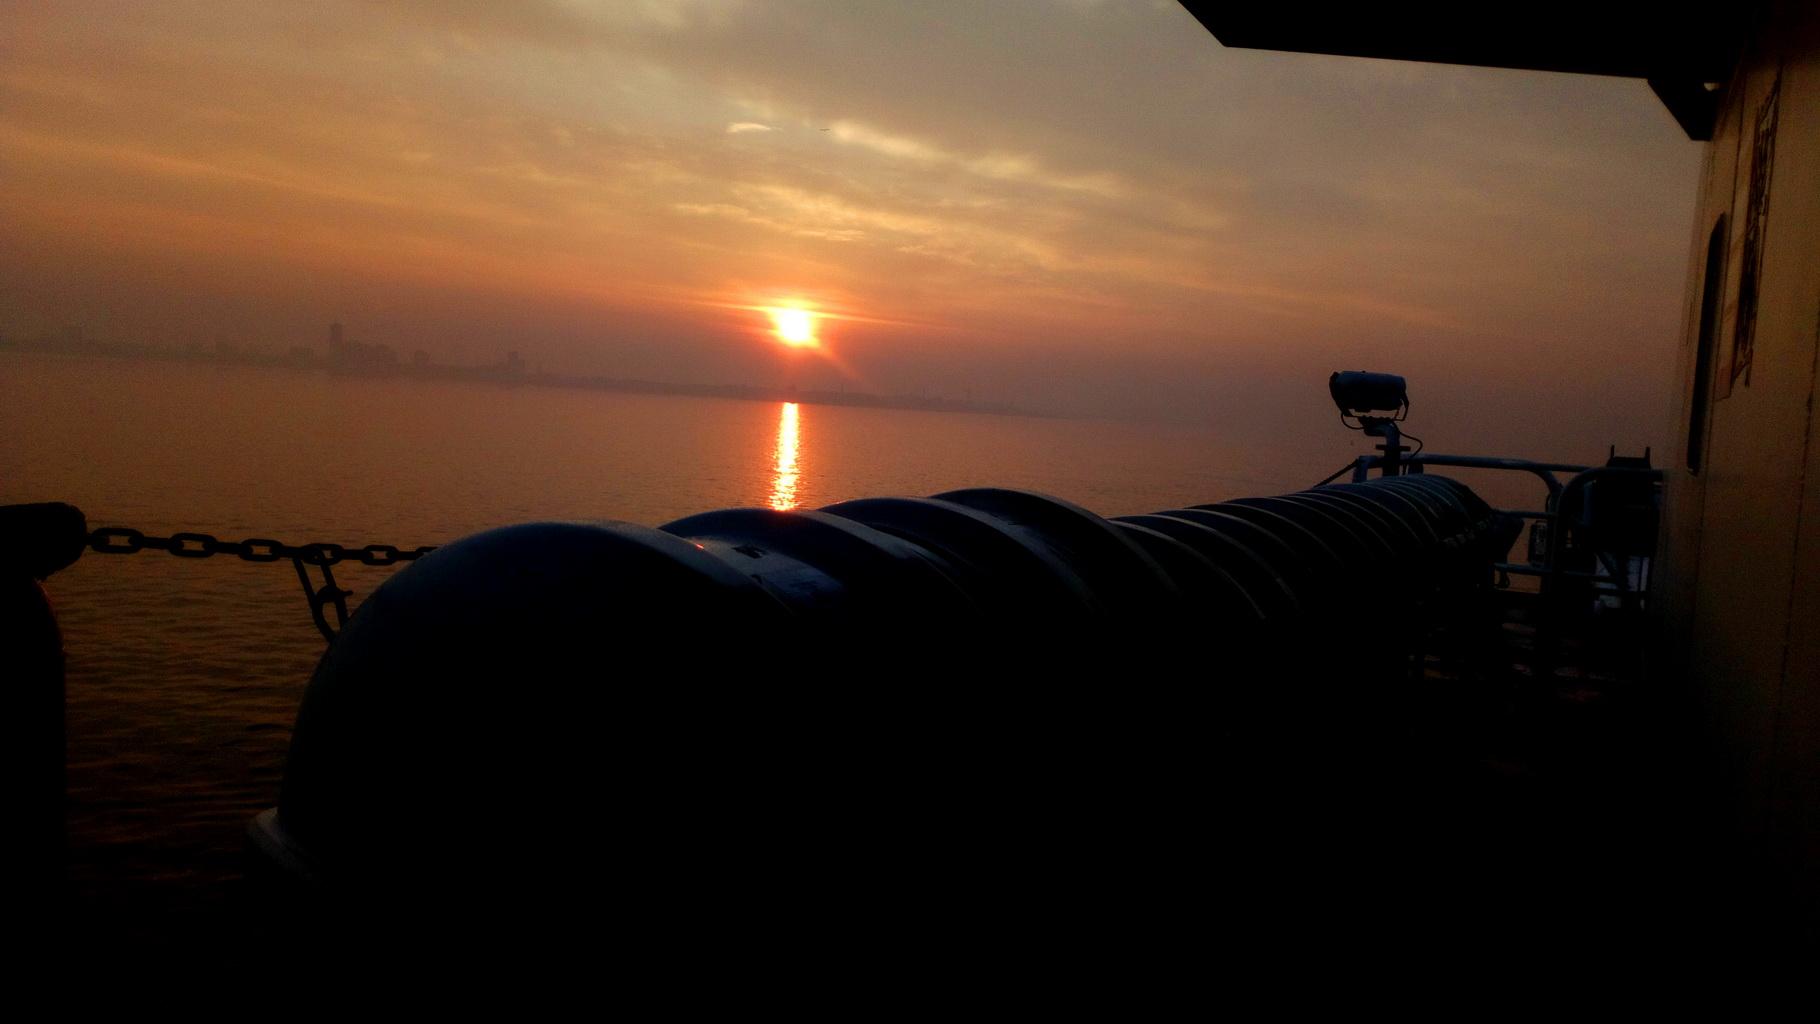 Dawn05.jpg